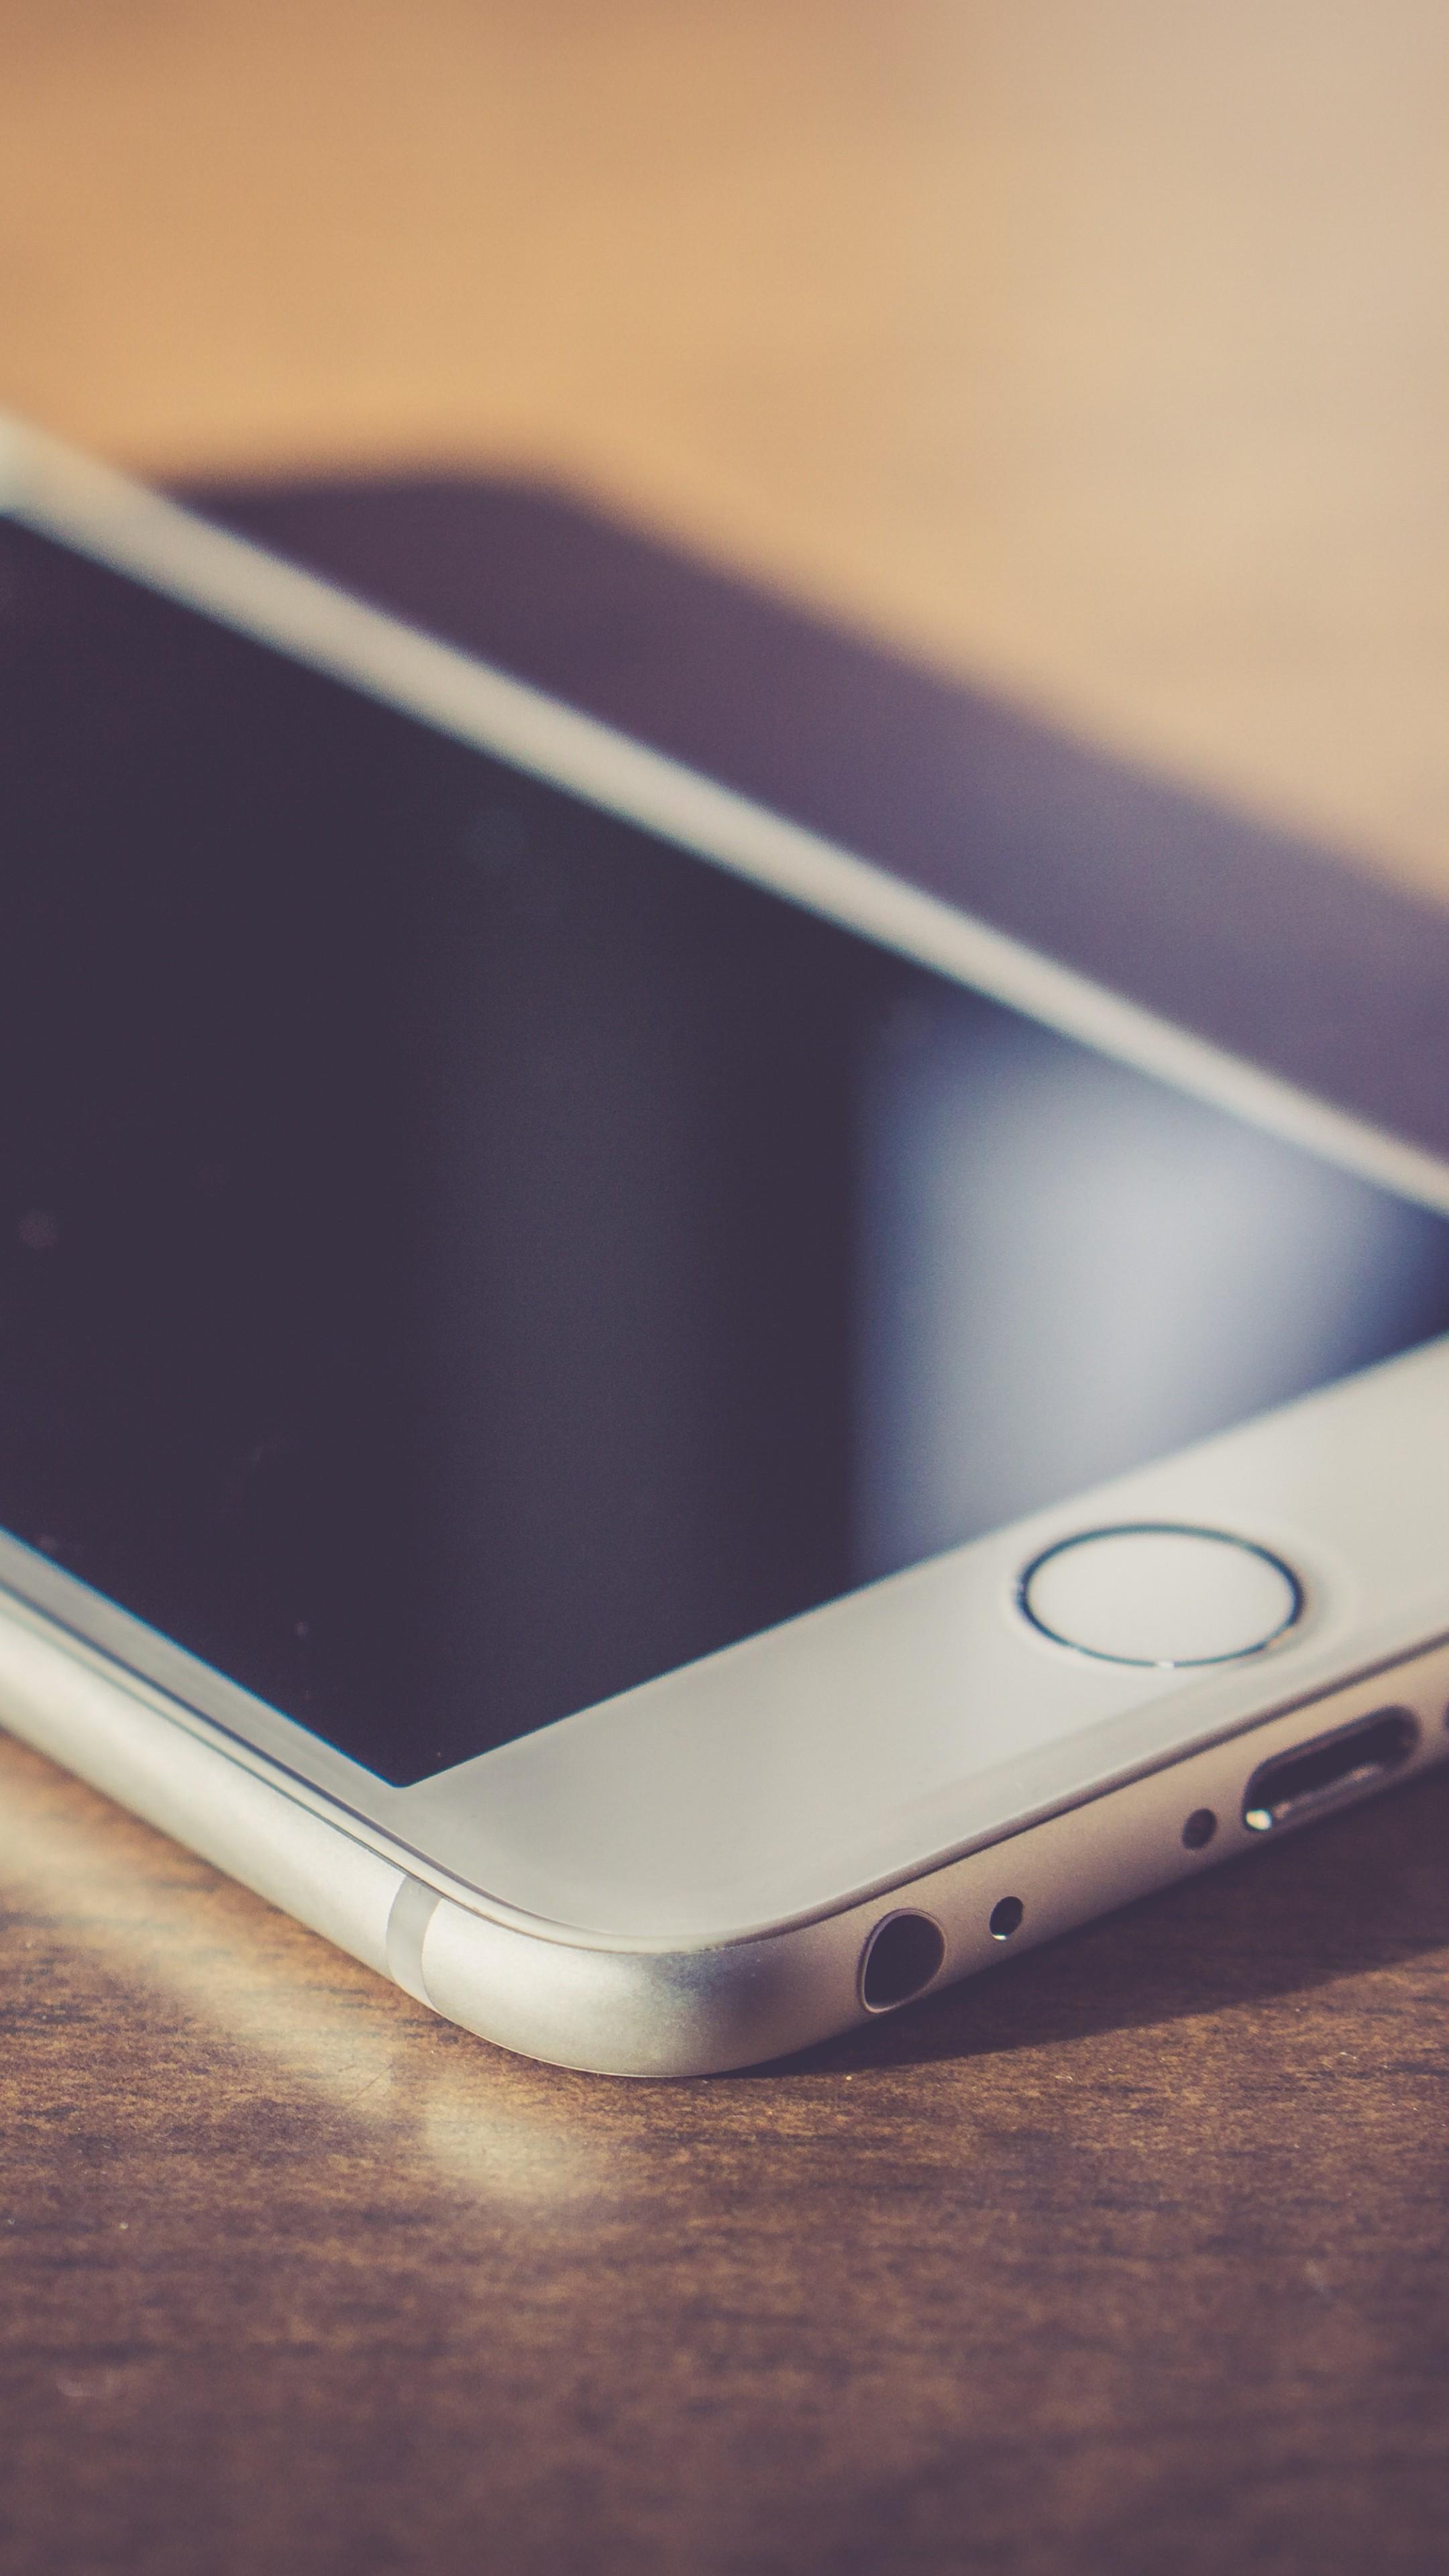 Wallpaper iphone, iphone 6, apple